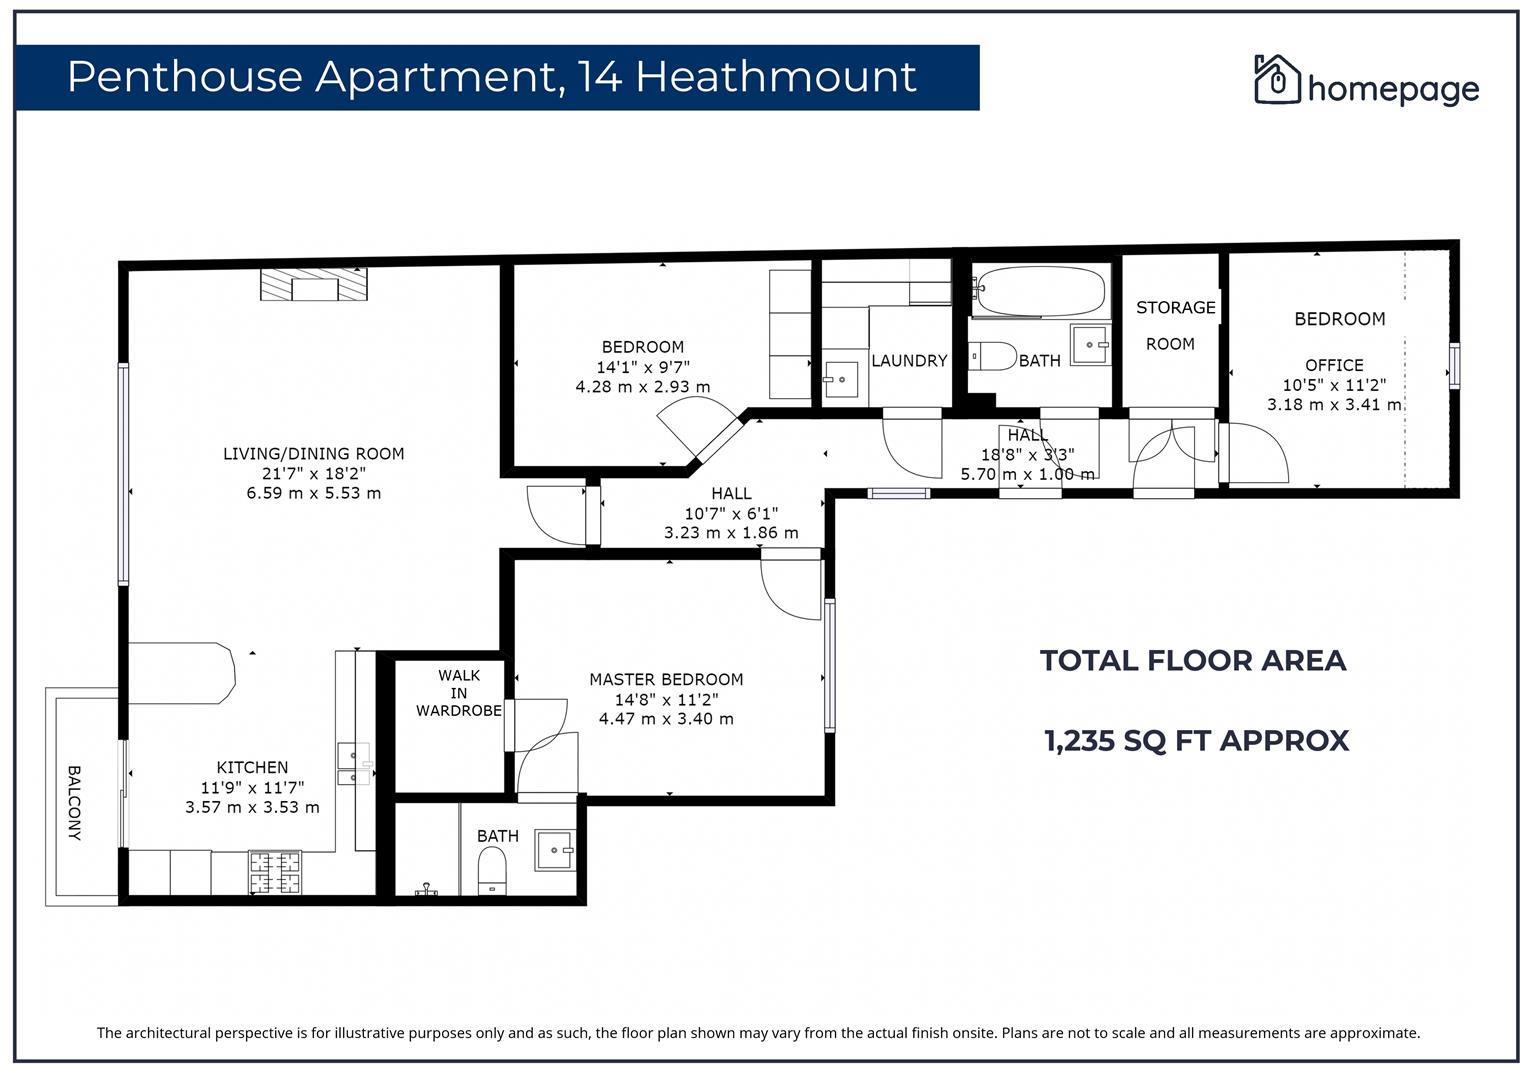 Penthouse apartment 14 heathmount  floor plan.jpg